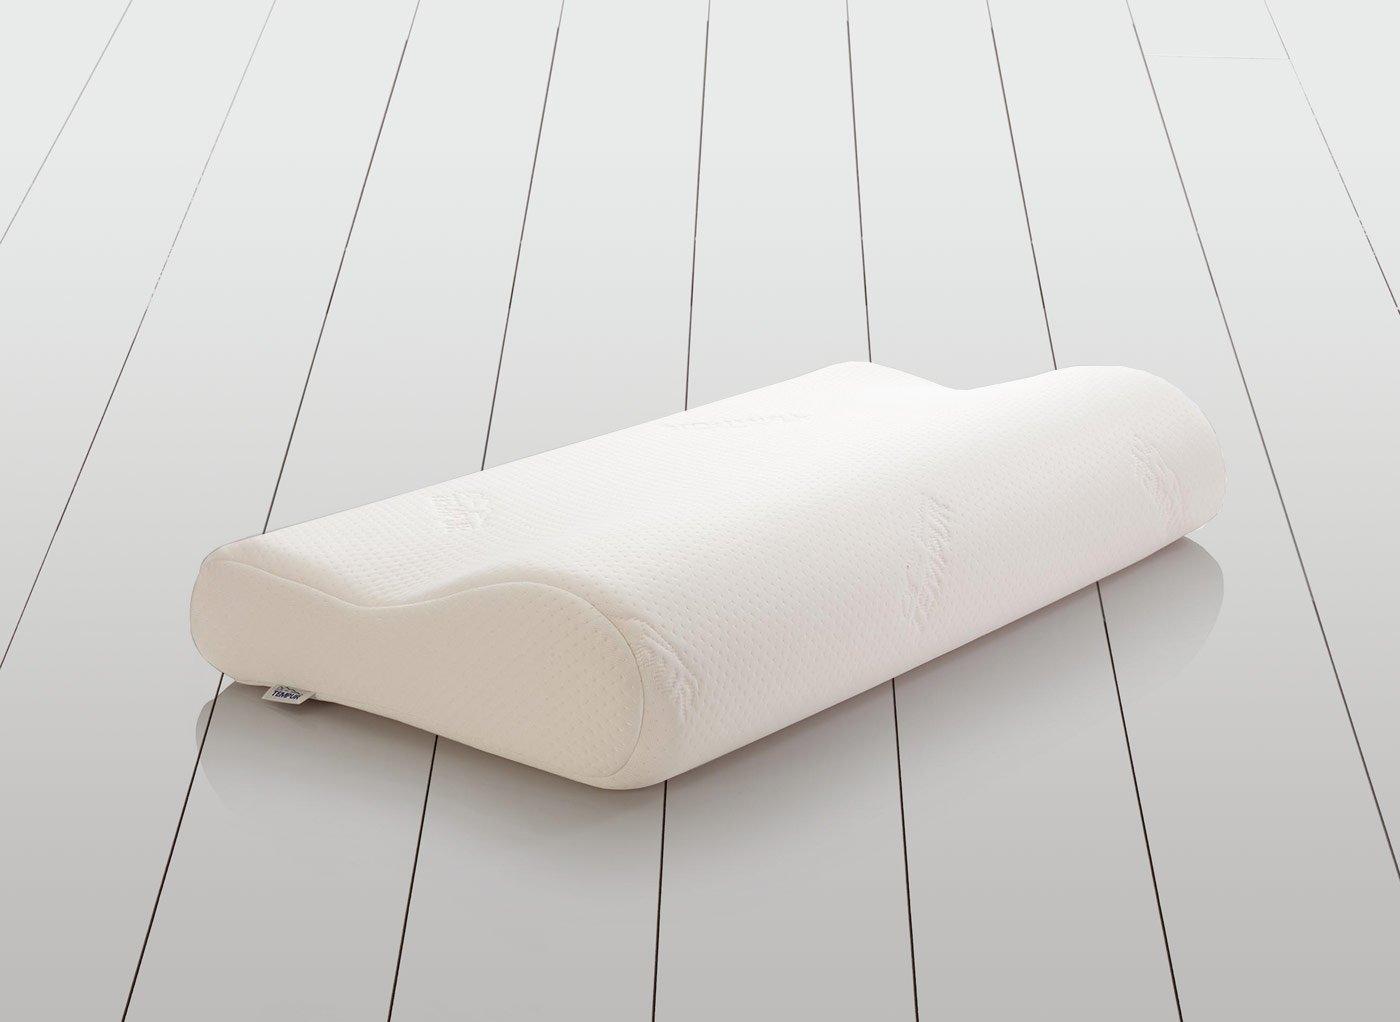 tempur-queen-original-neck-pillow